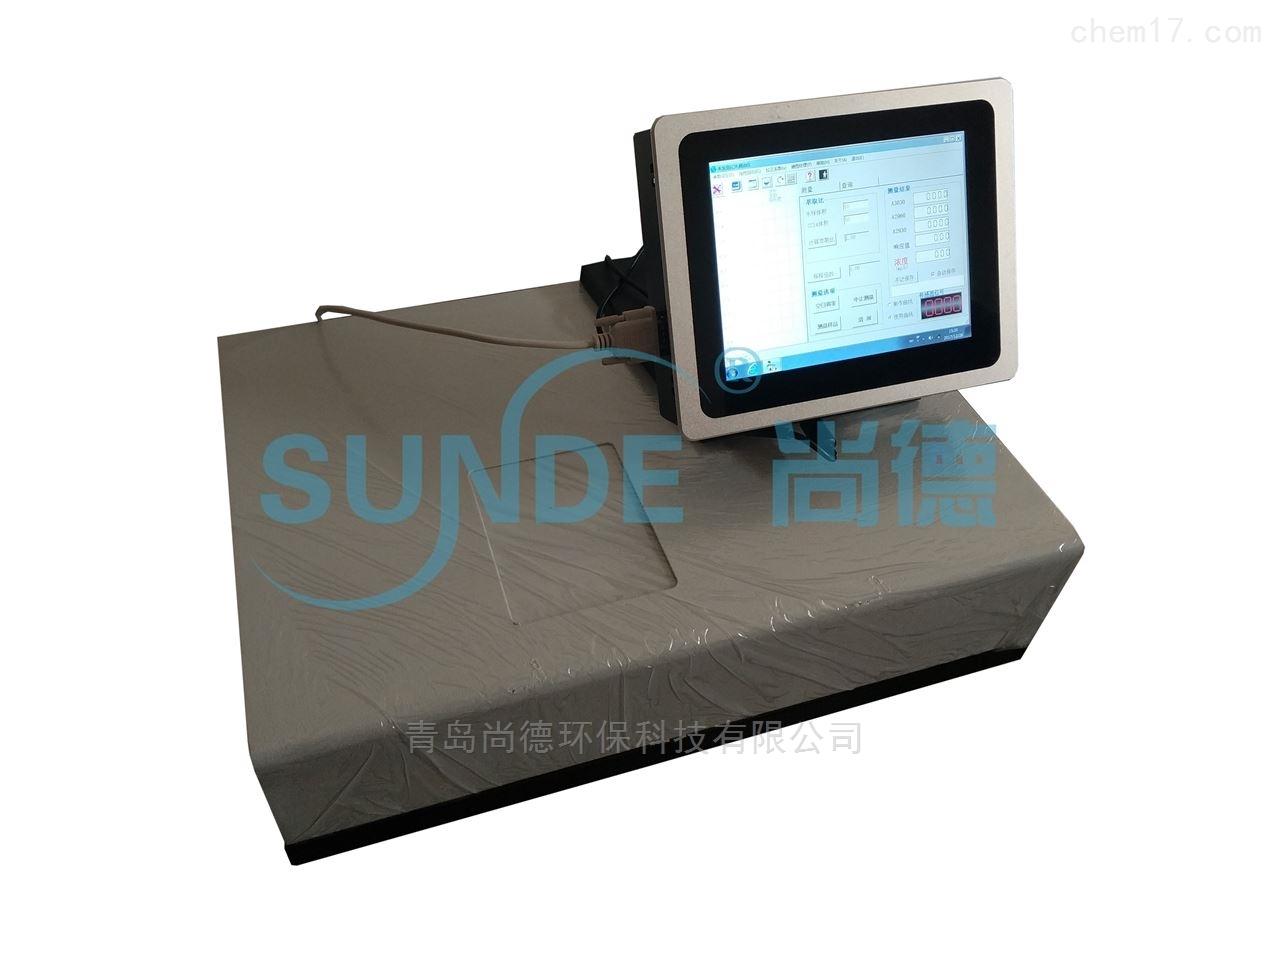 SN-OIL8H 台式触摸屏红外测油仪